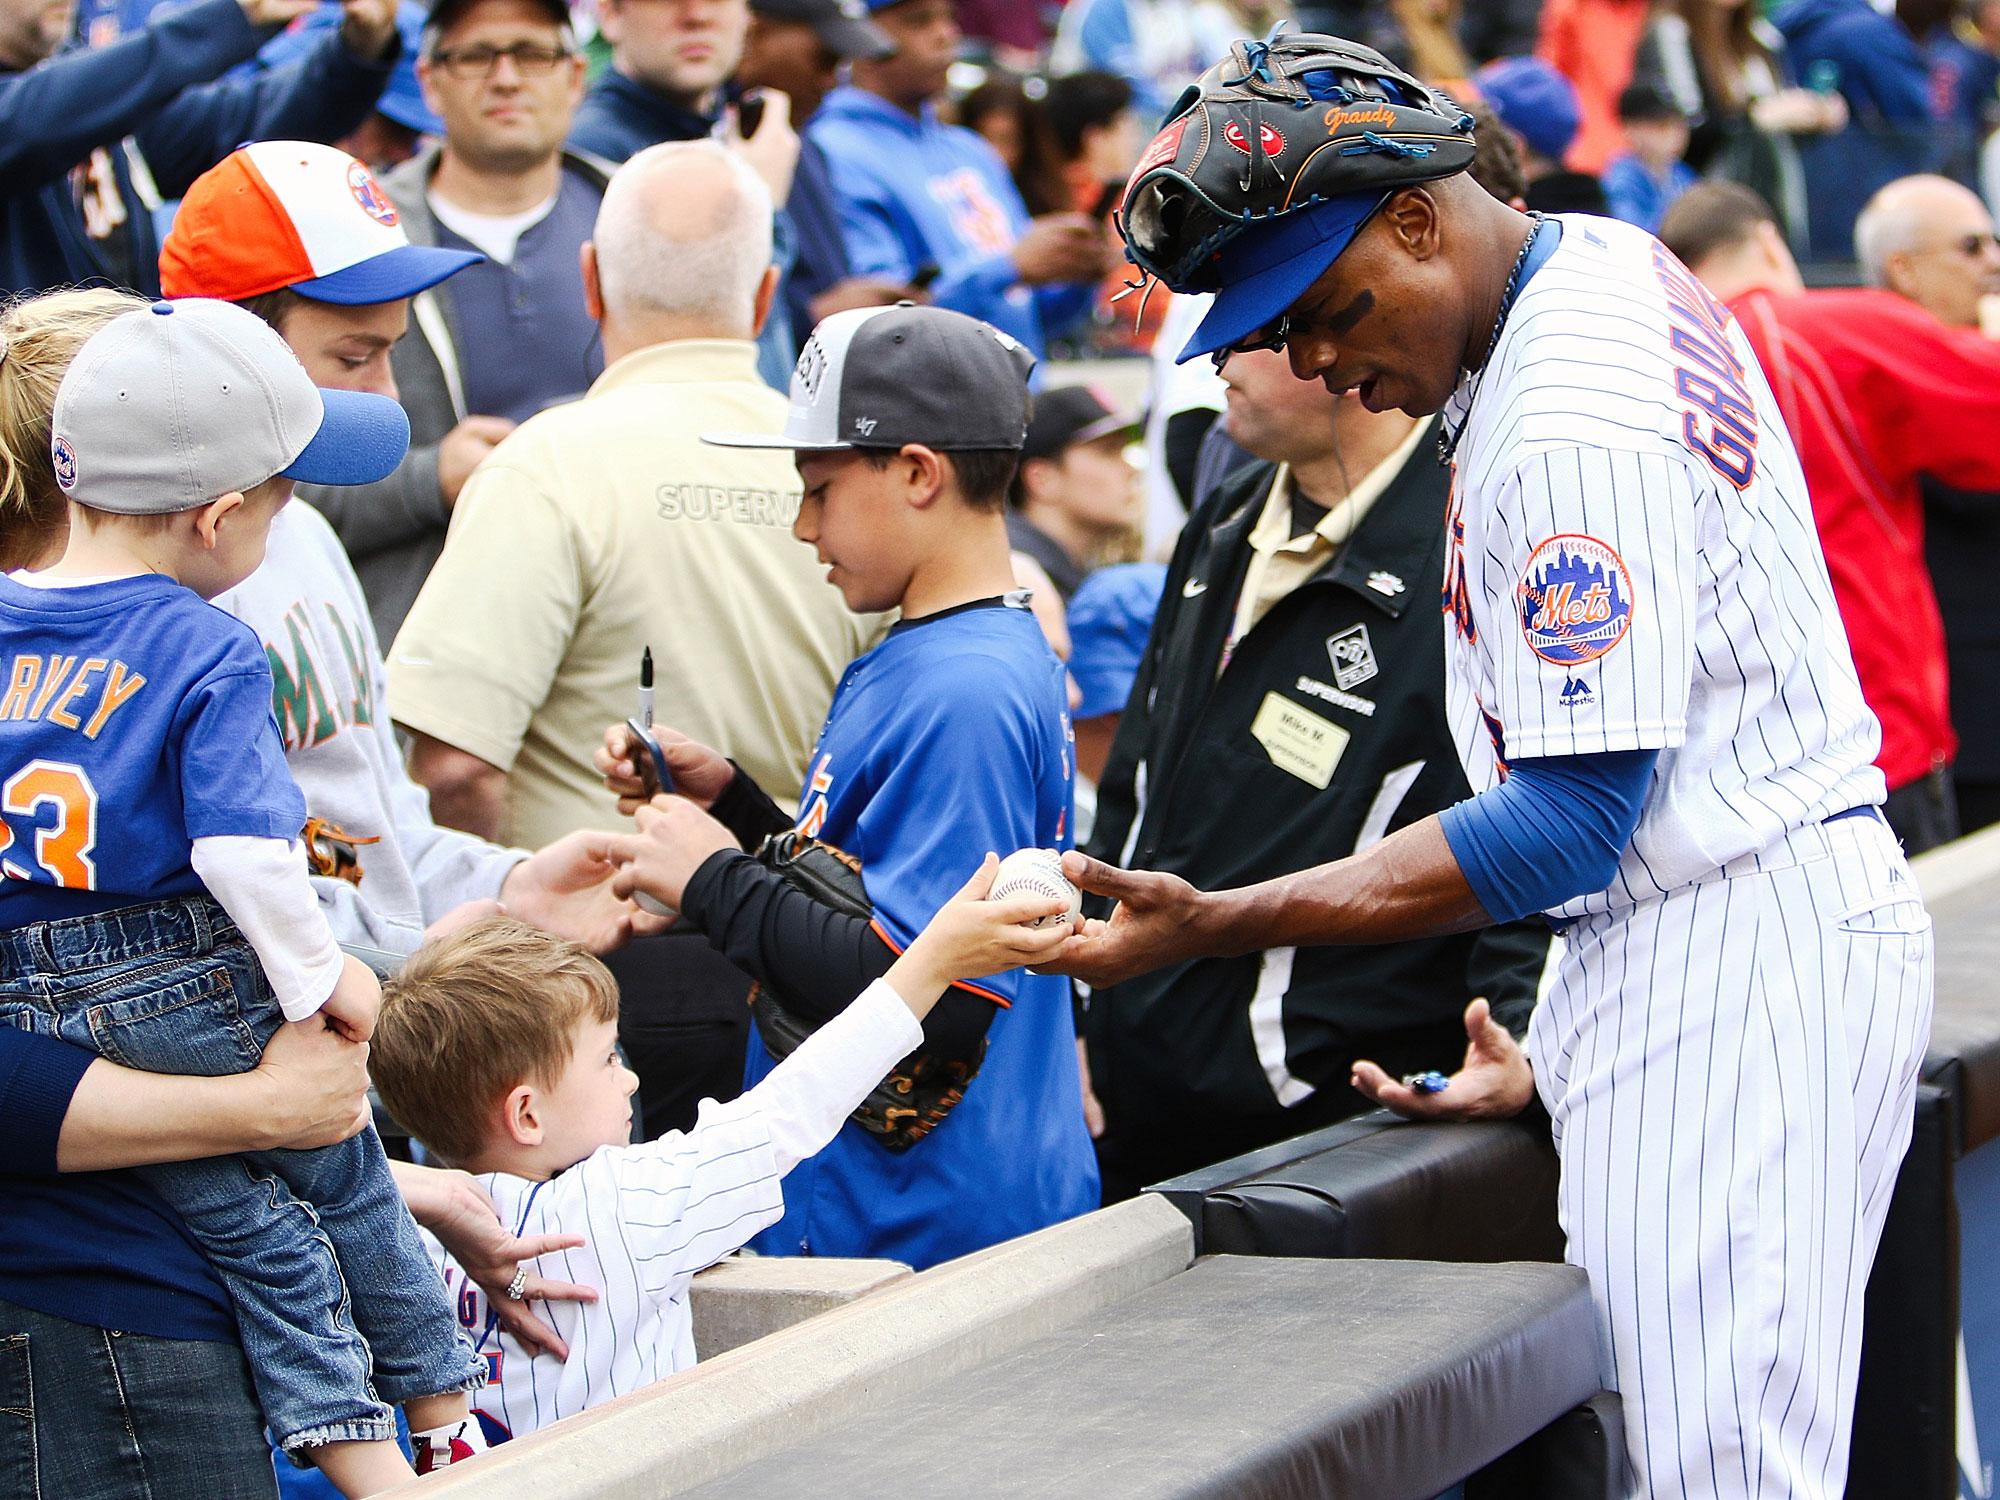 Curtis Granderson, New York Mets